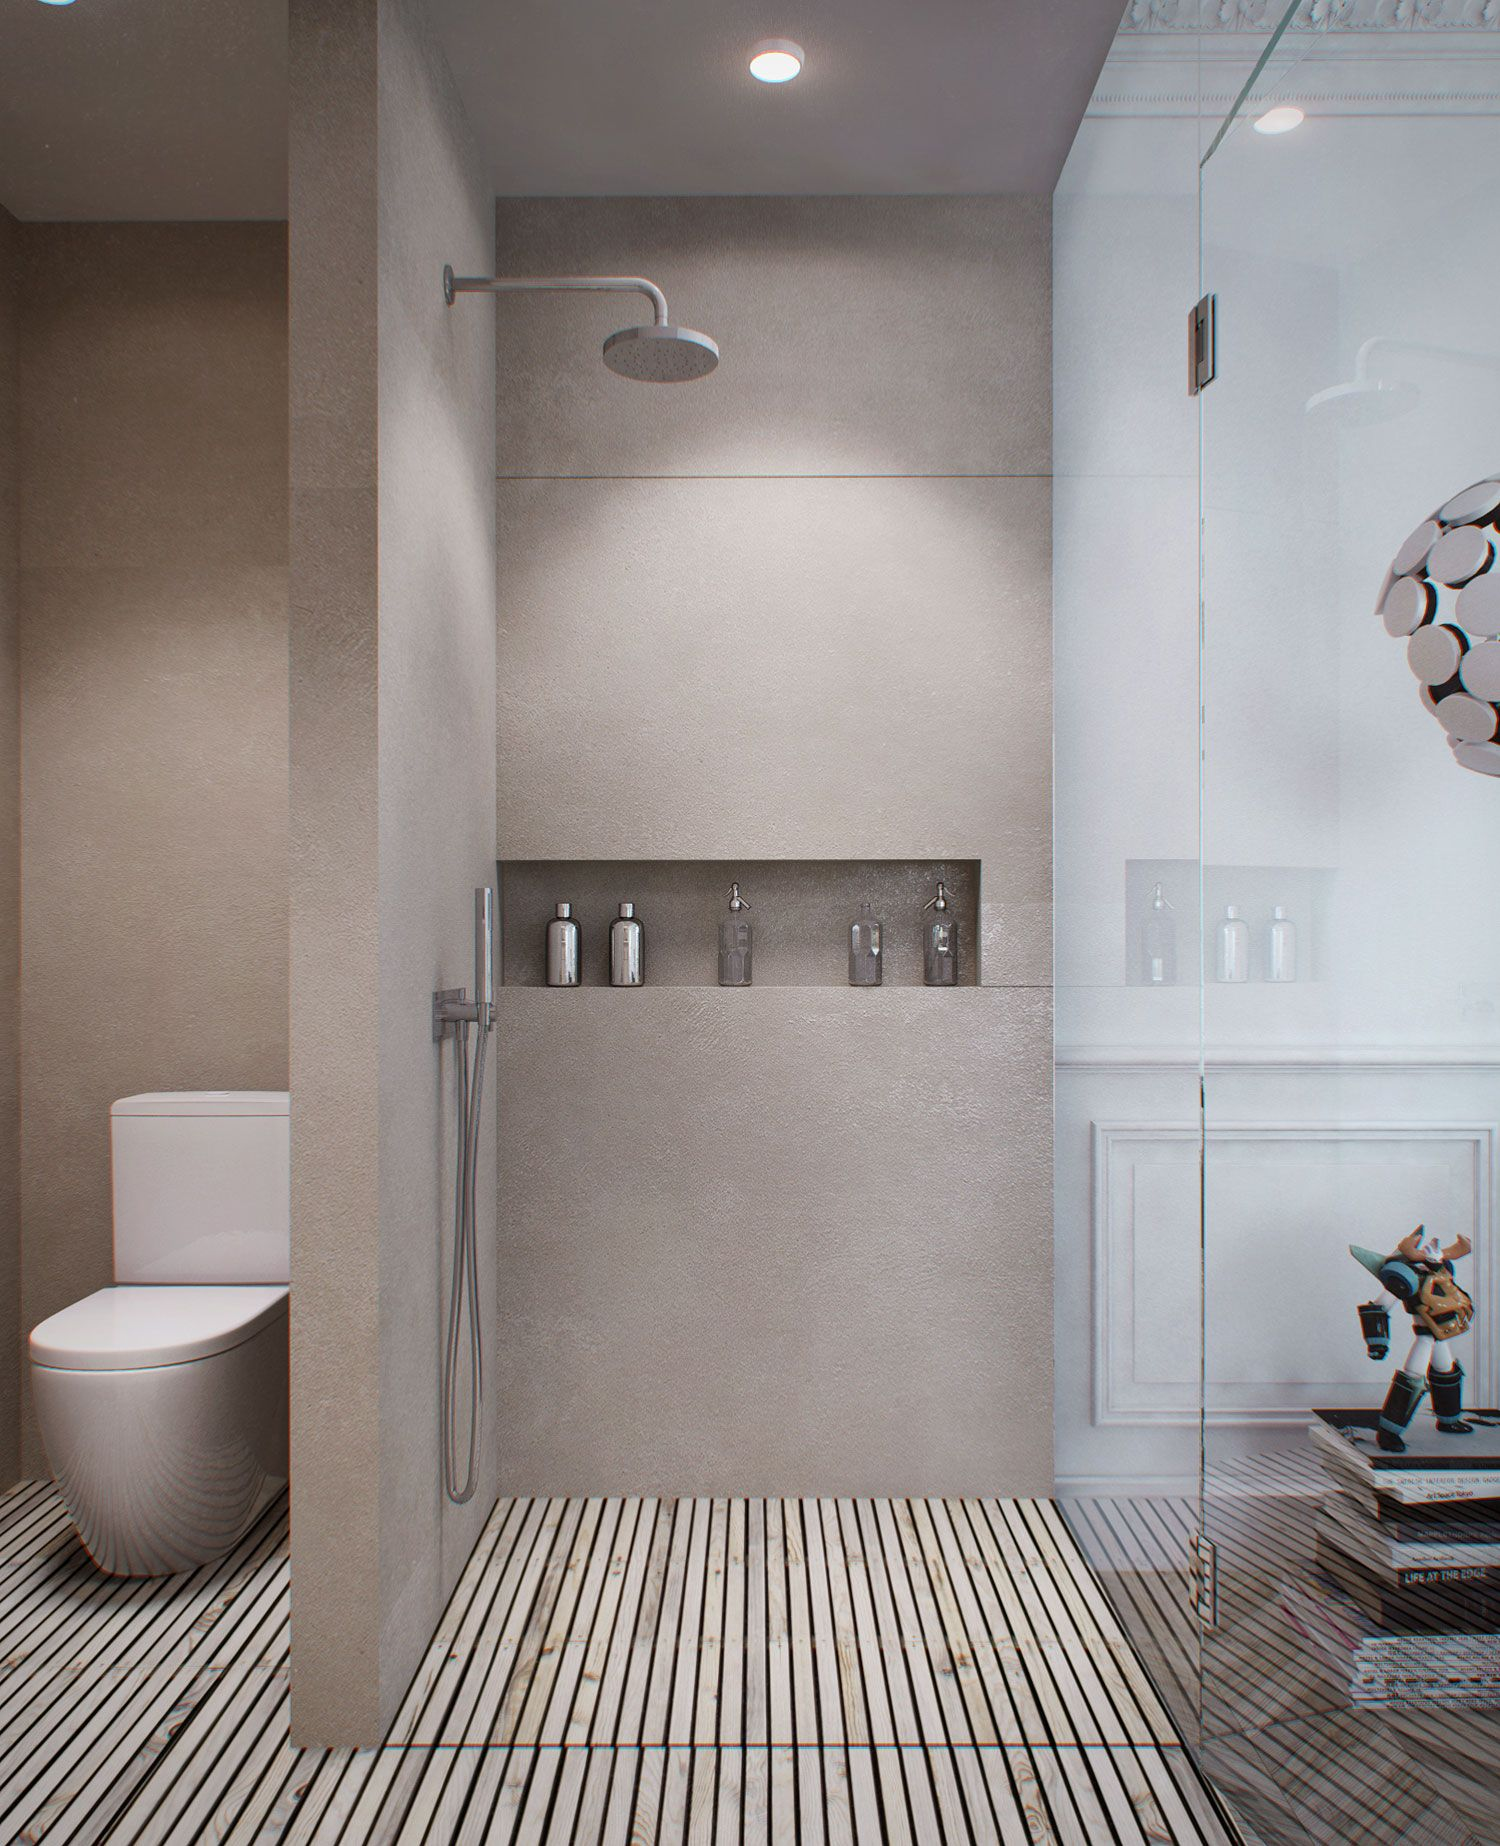 petite salle de bain design 2015 - Recherche Google | salle de bain ...